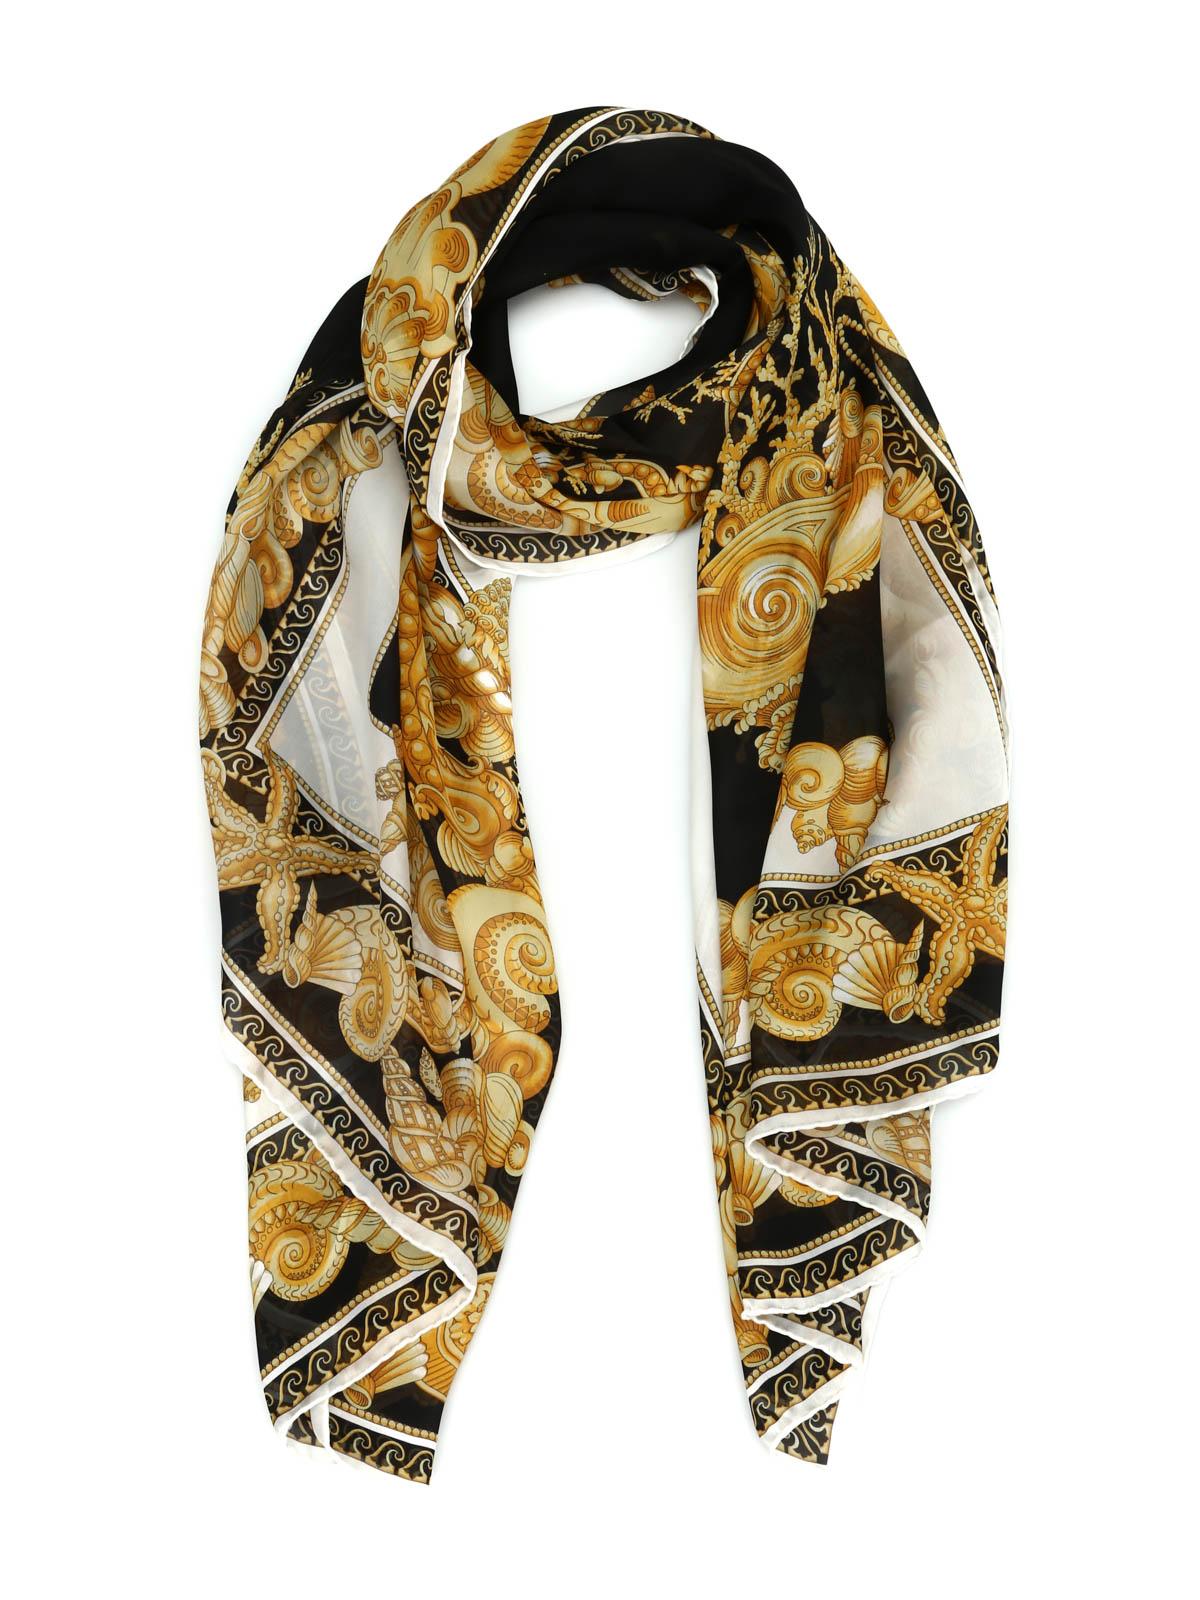 9cc4e2c9efa Versace - Oceanic Barocco scarf - scarves - IST7002 IT00397 I7910